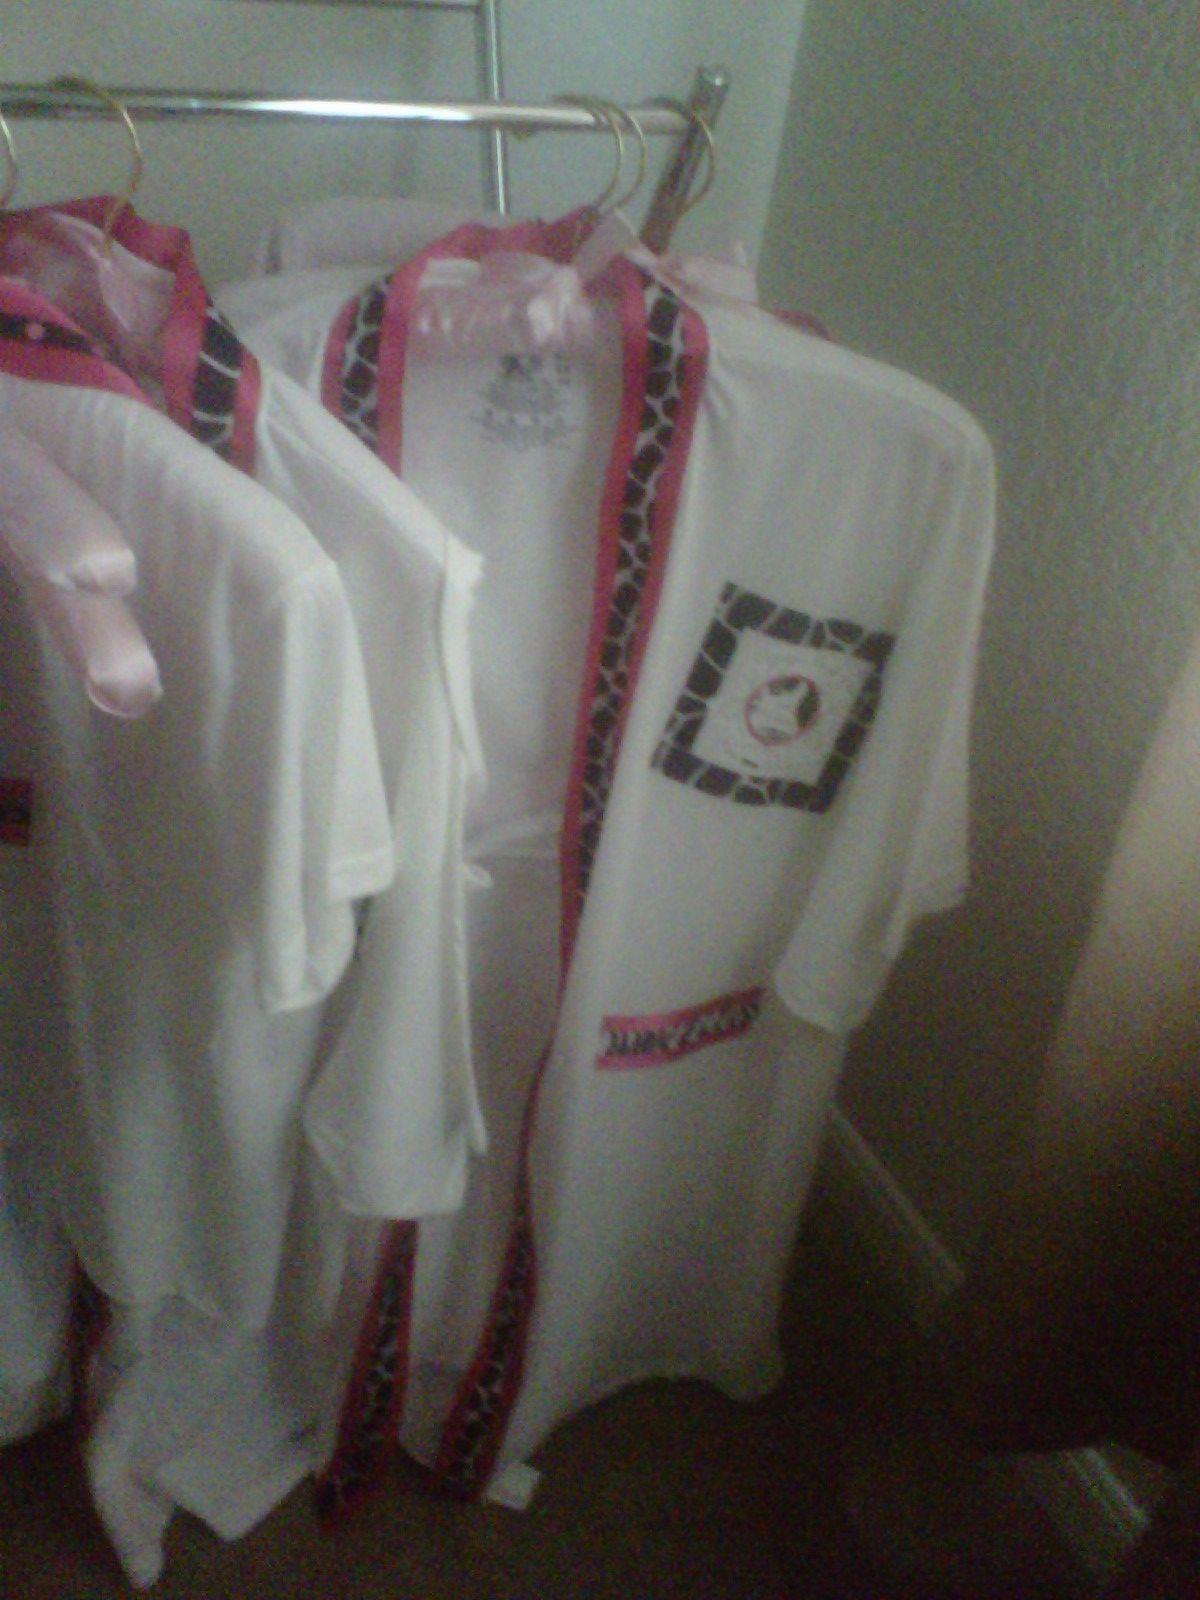 79102c2f28 Cute spa party idea! To create the robe....cut the t-shirt down the ...